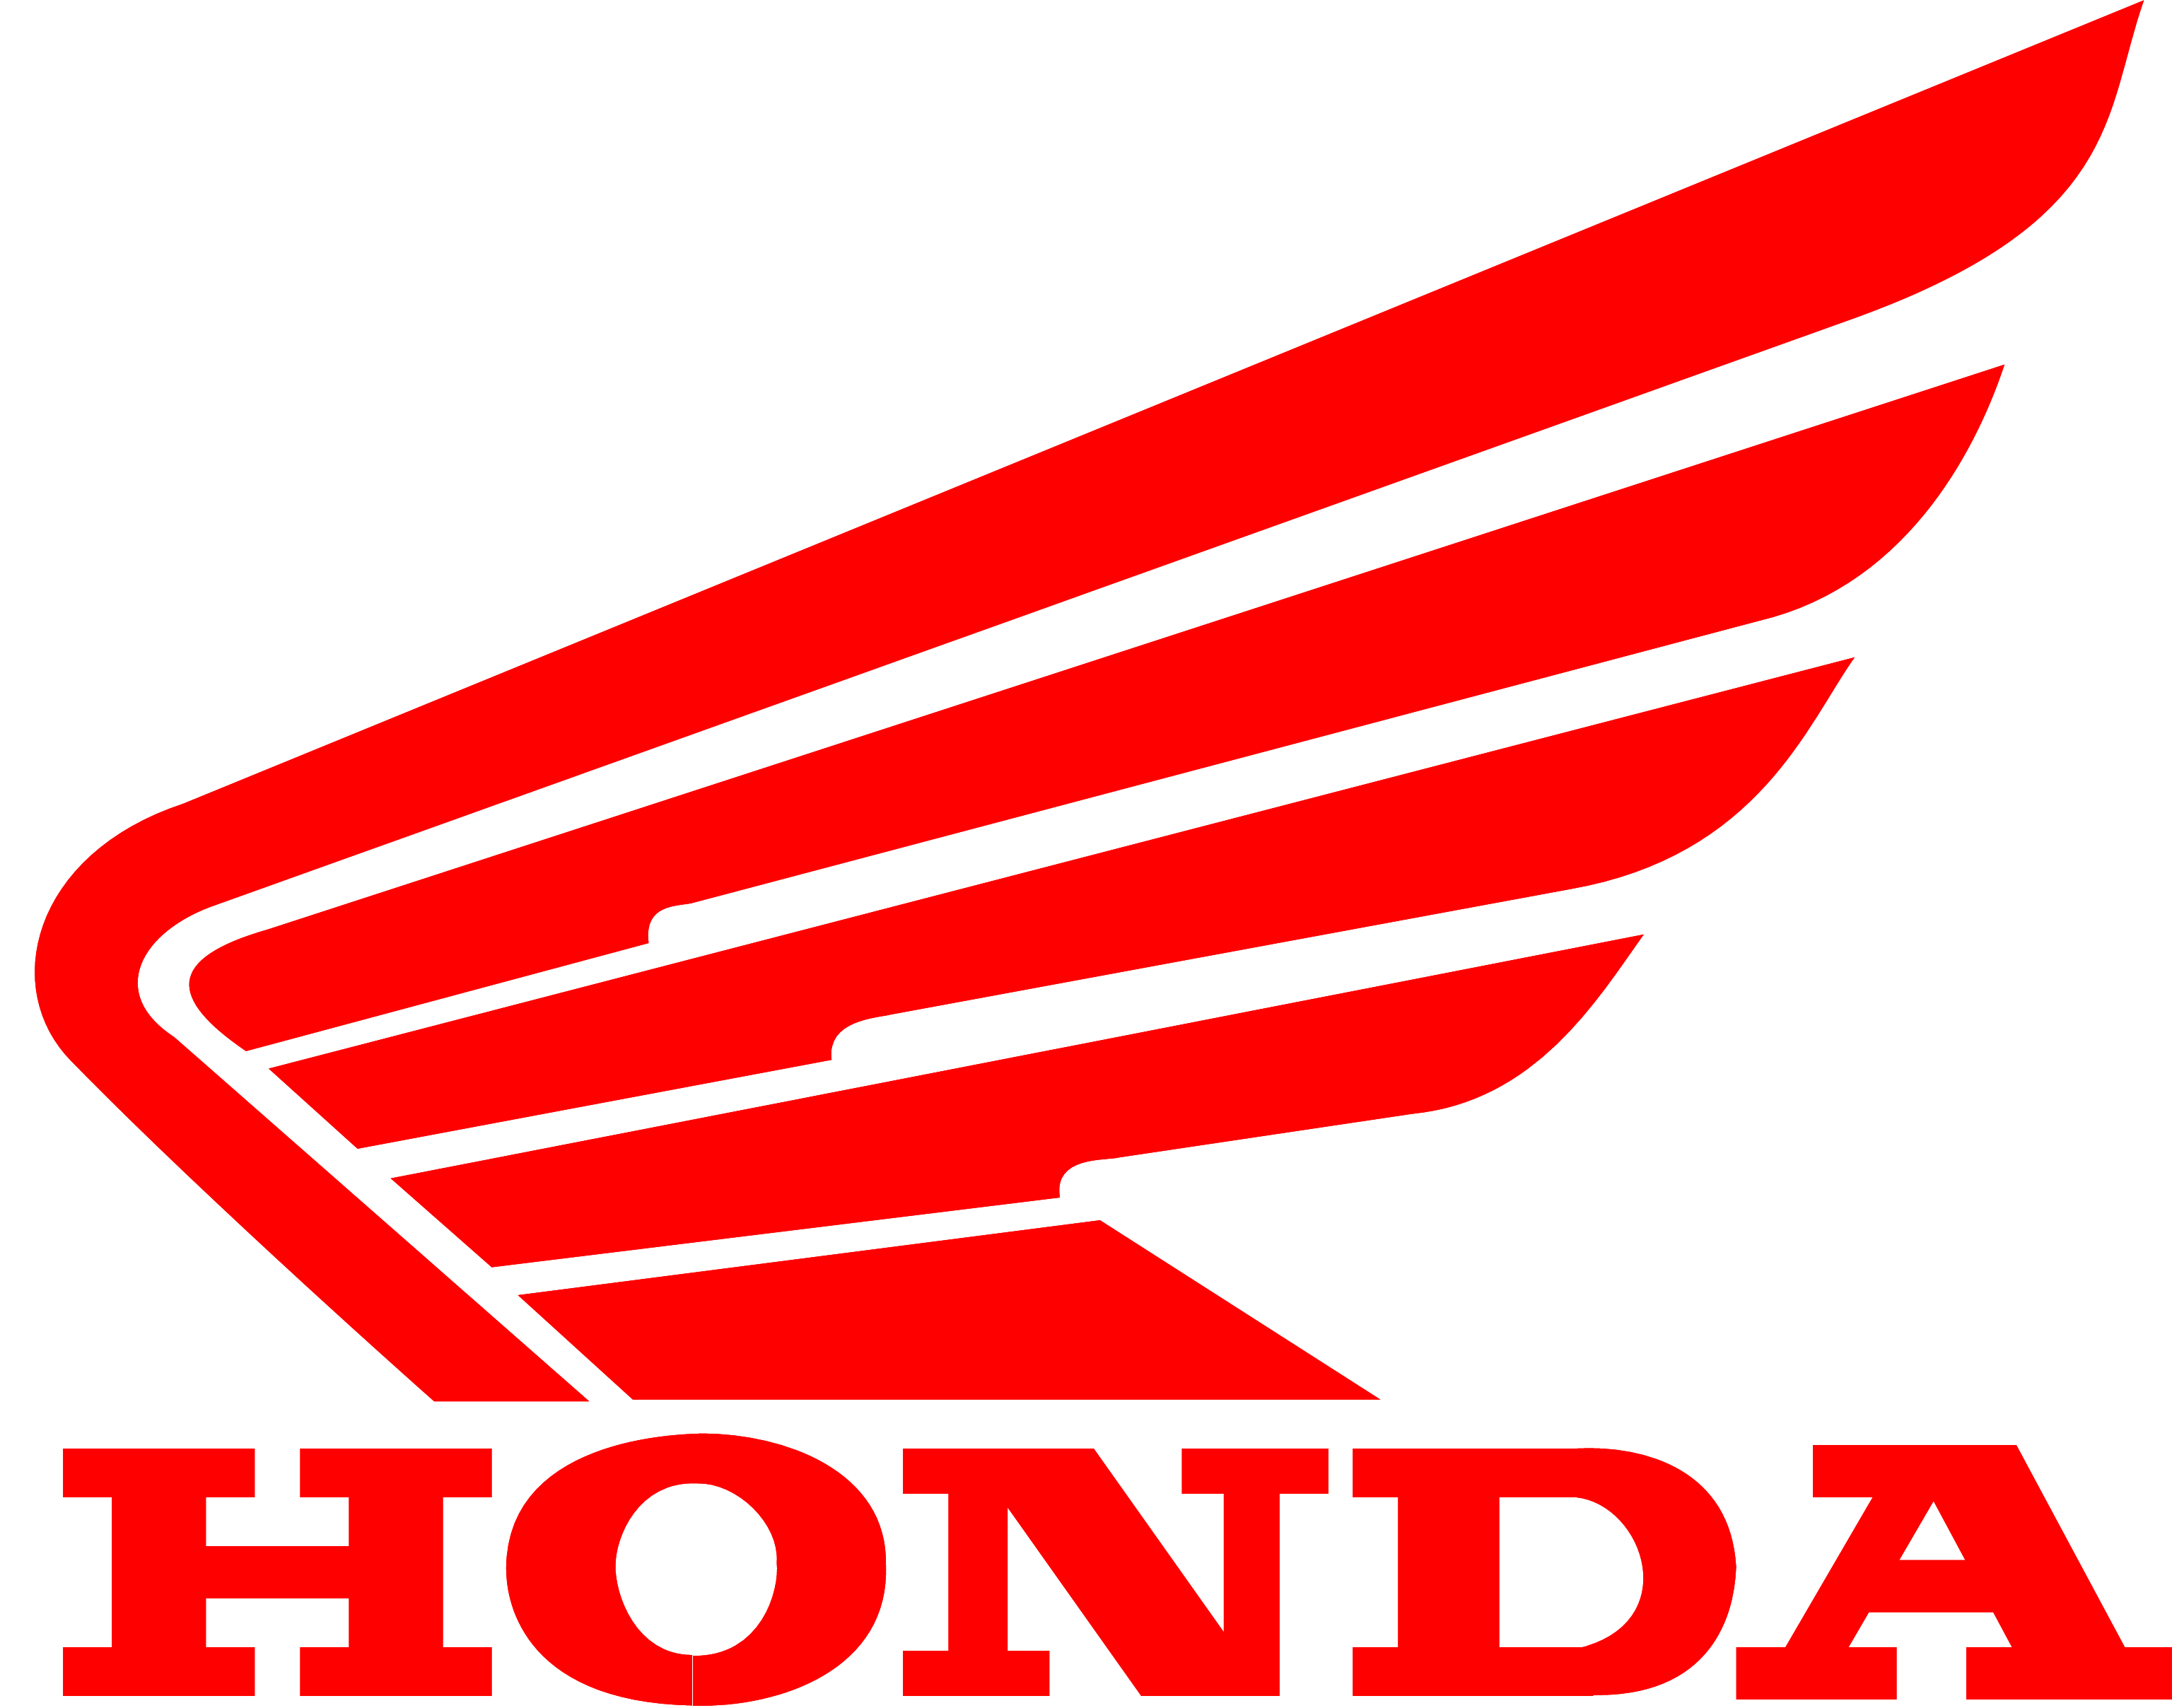 Pngs of honda clip art free Honda Logos Png – animesubindo.co clip art free